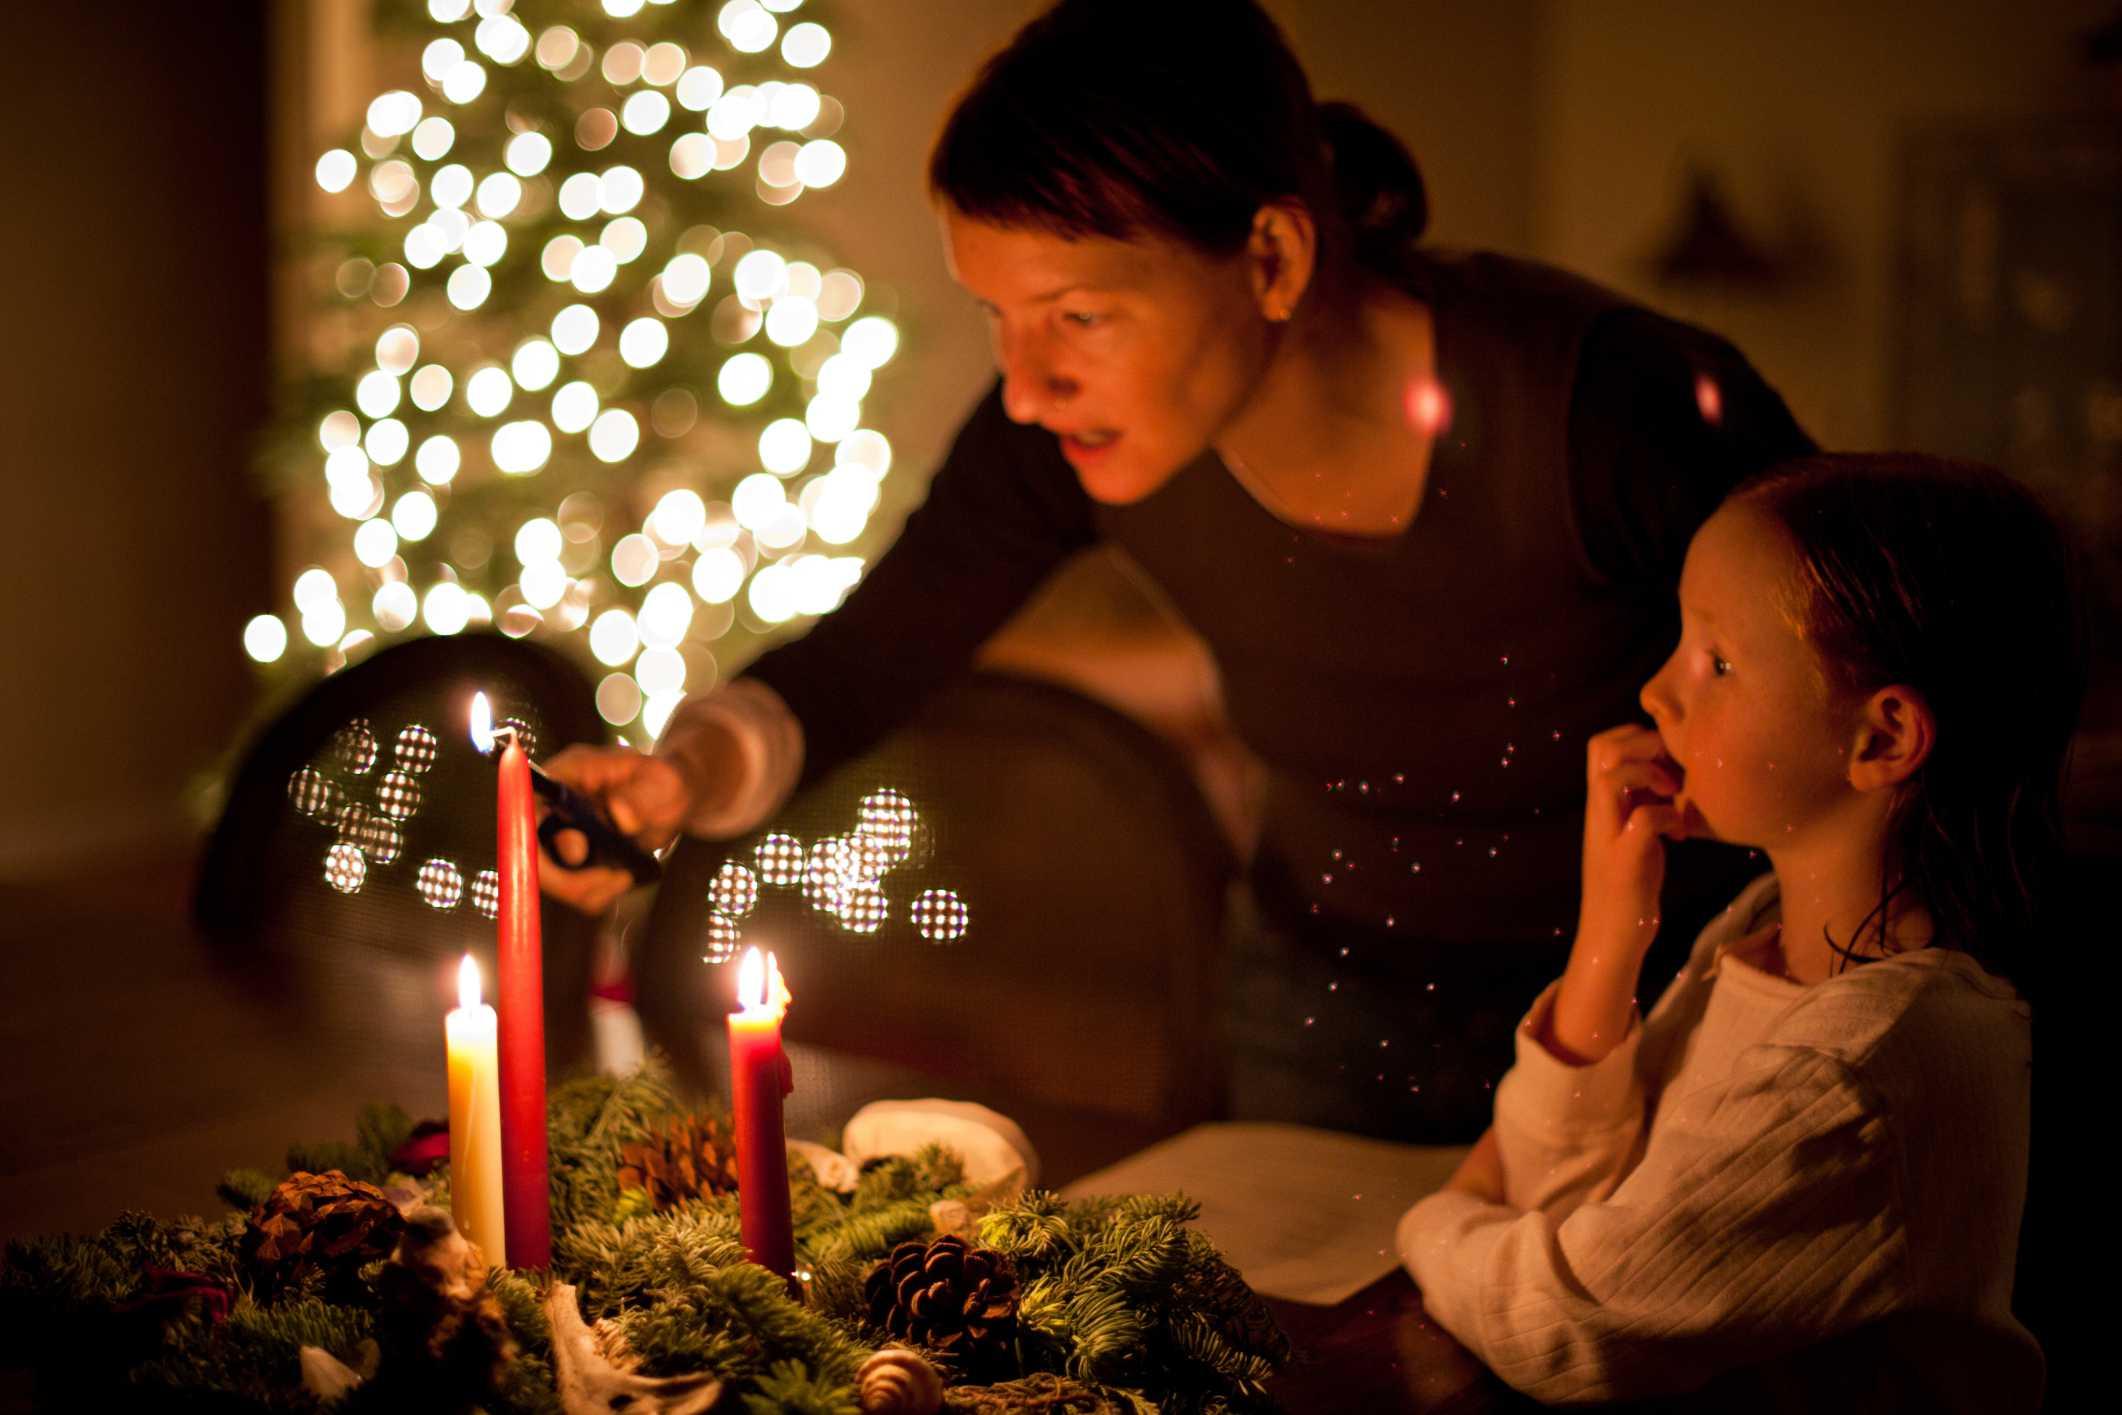 Christian Christmas Words Associated With the Season